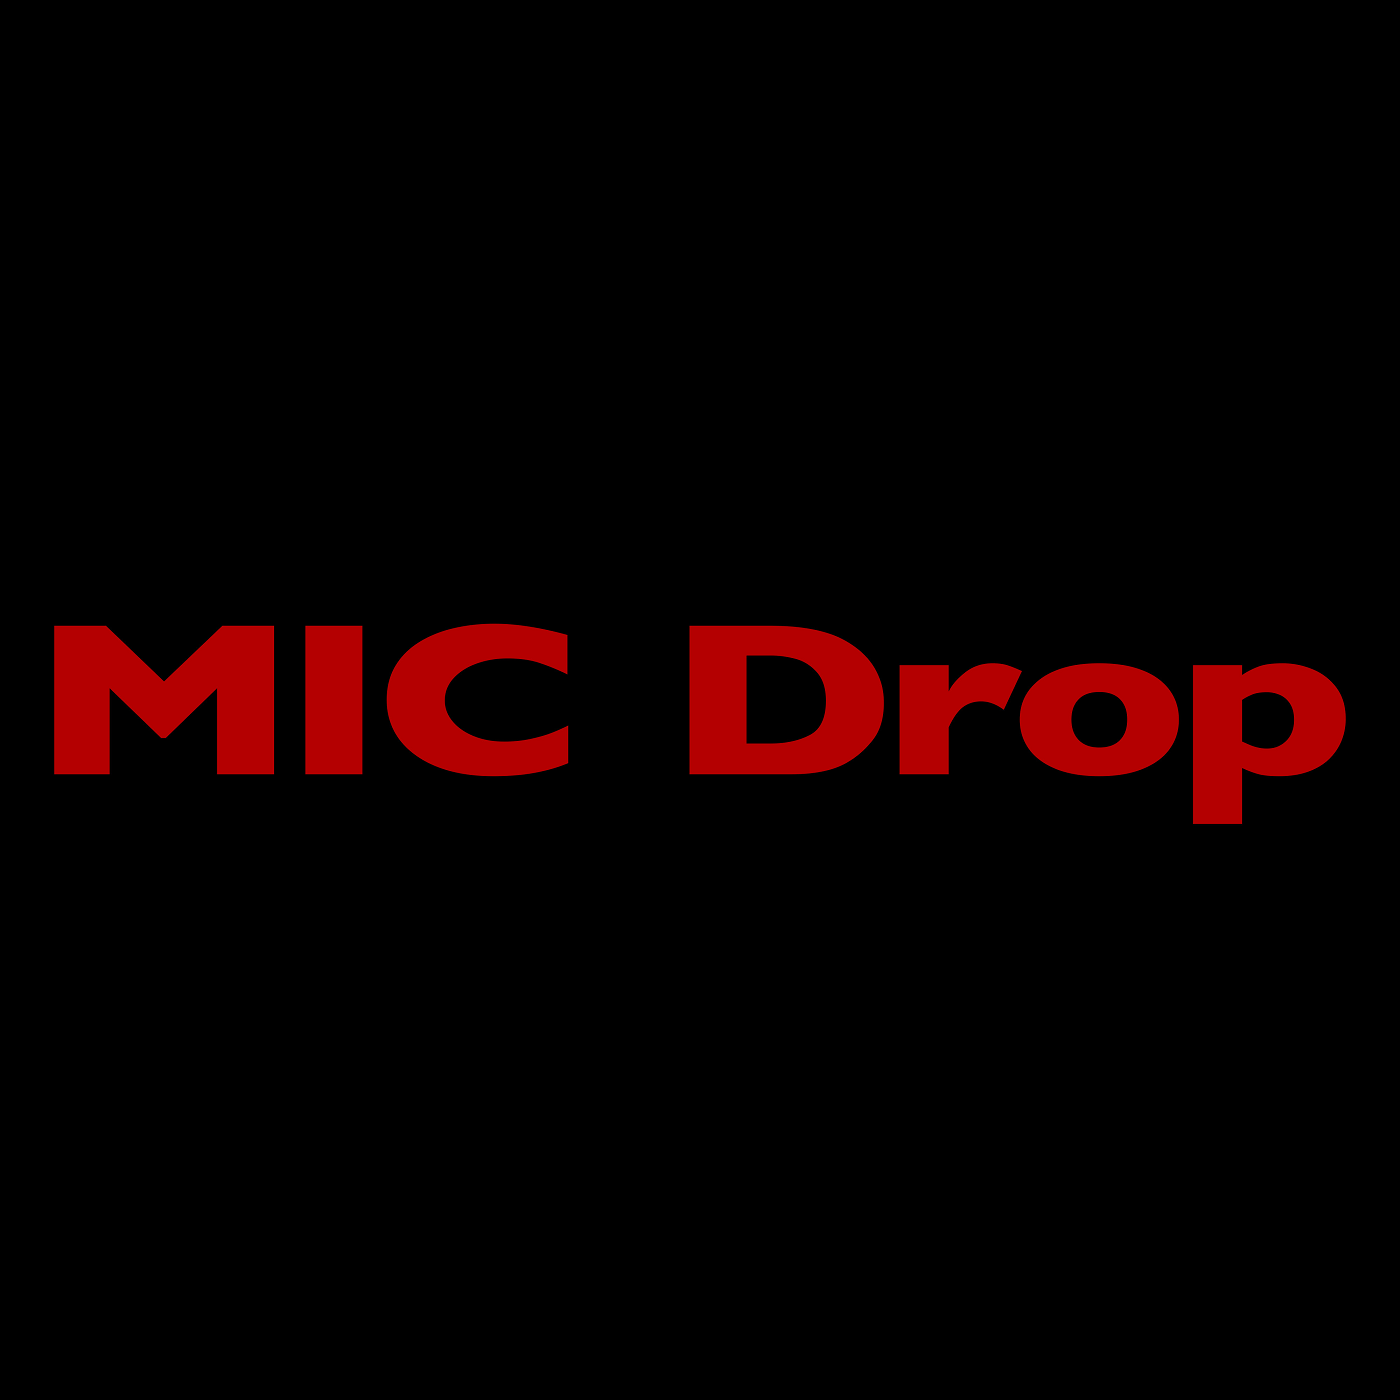 MIC Drop (Steve Aoki Remix)